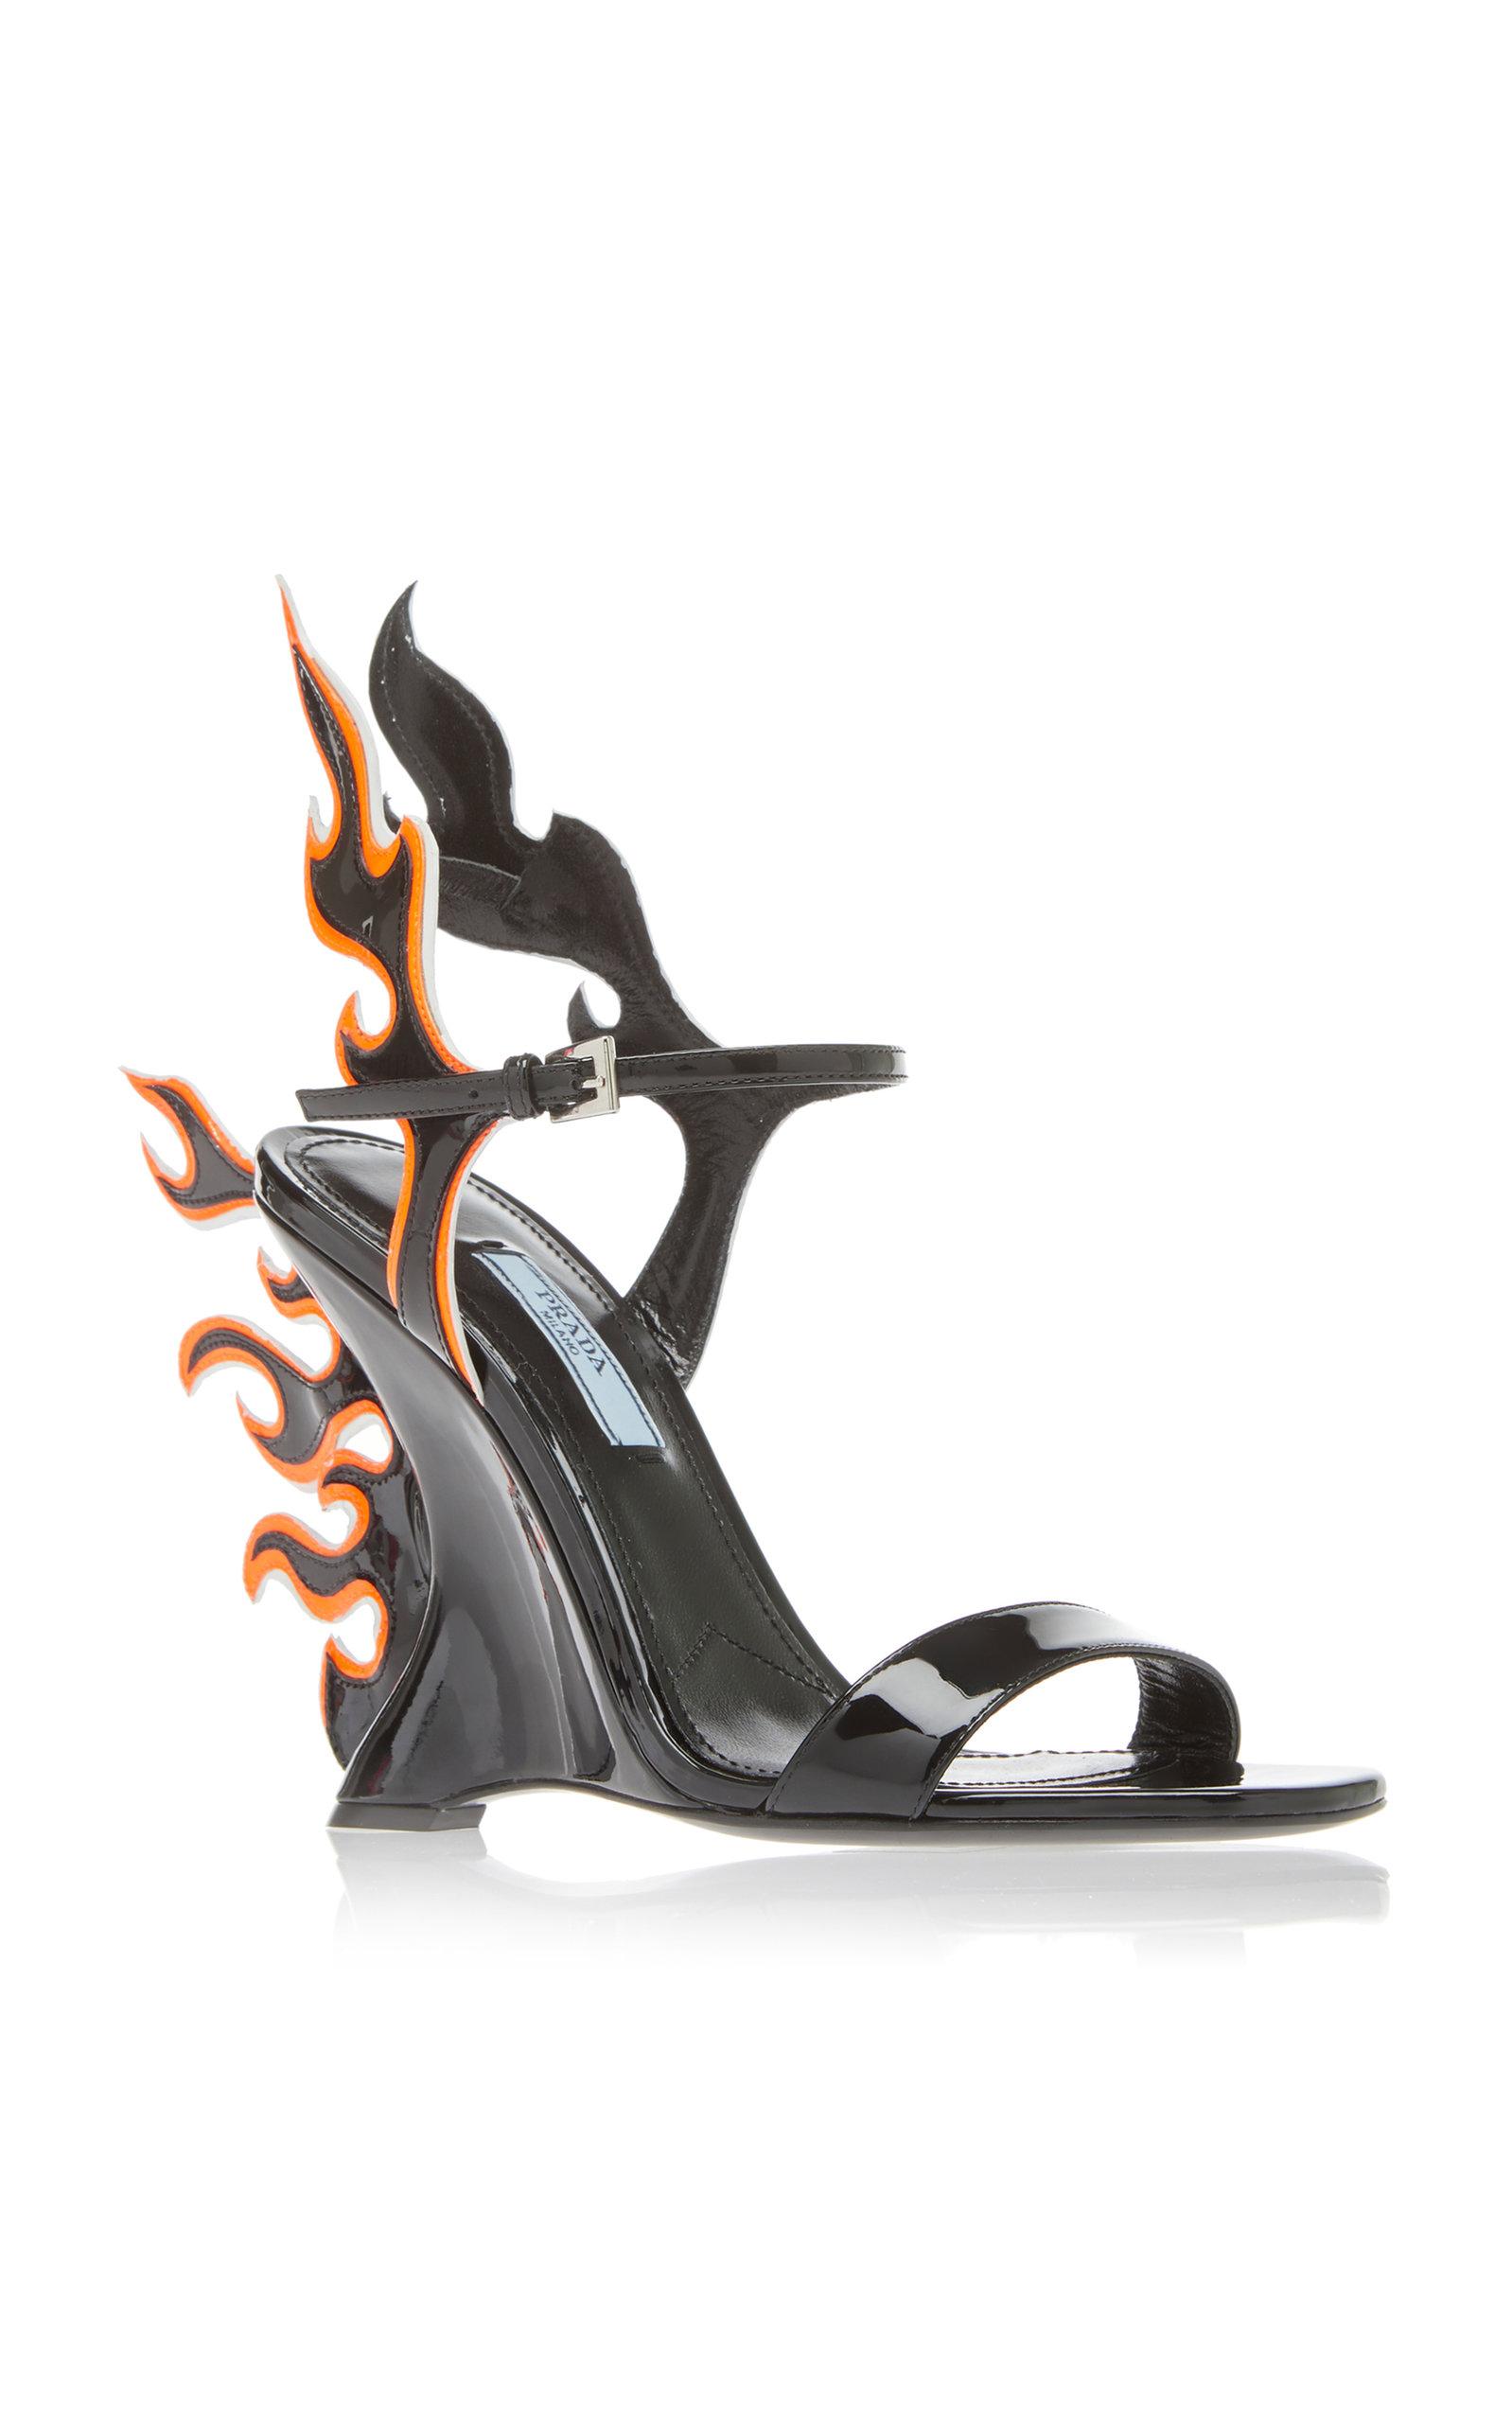 841f9d6f9065dc Flame Patent Leather Wedge Sandals by Prada   Moda Operandi